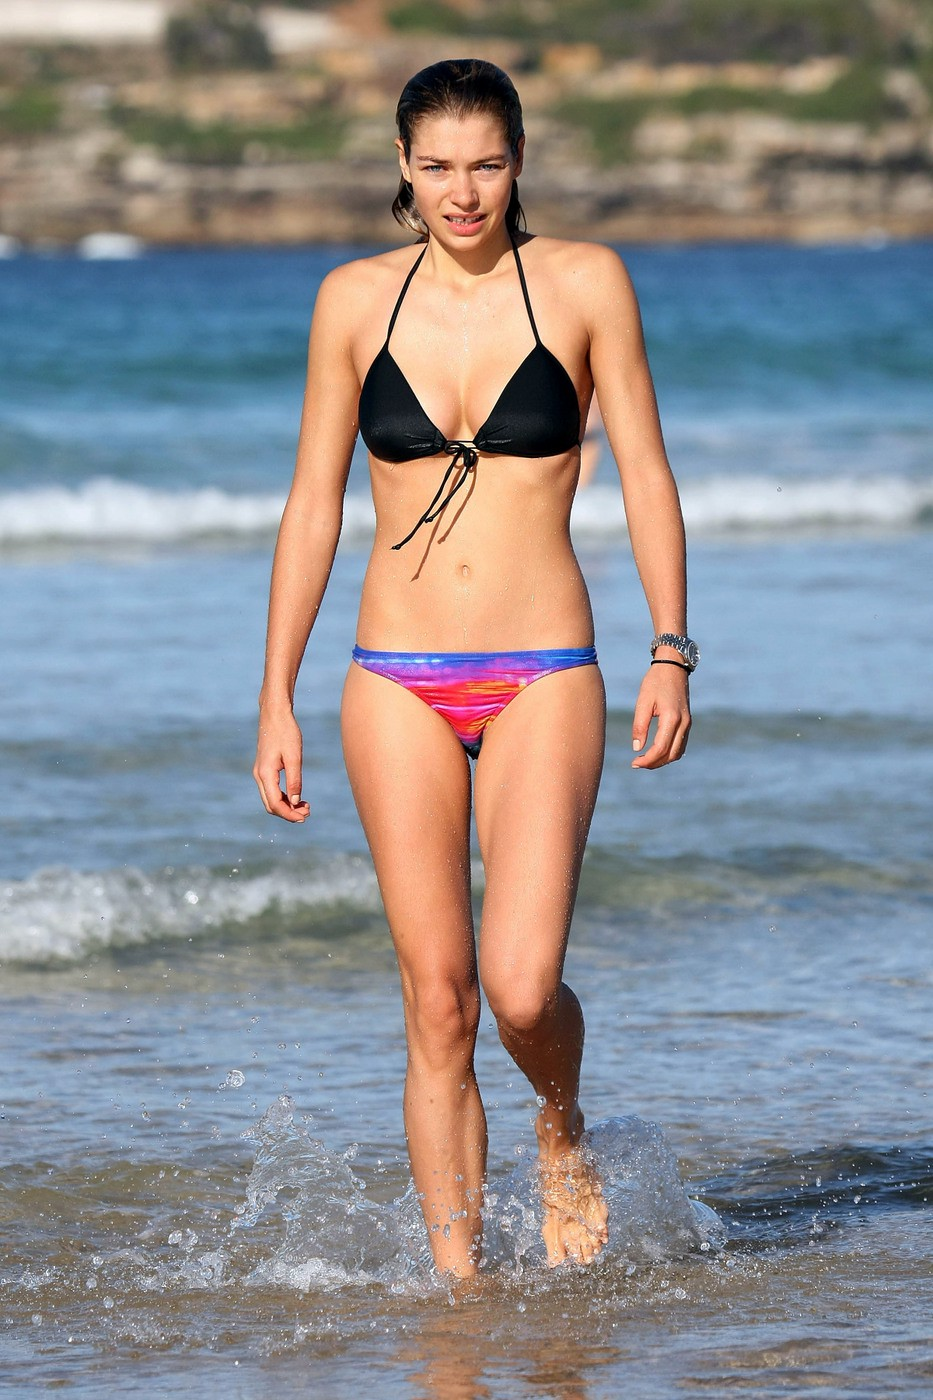 Jessica hart bikini pictures vacca &egrave